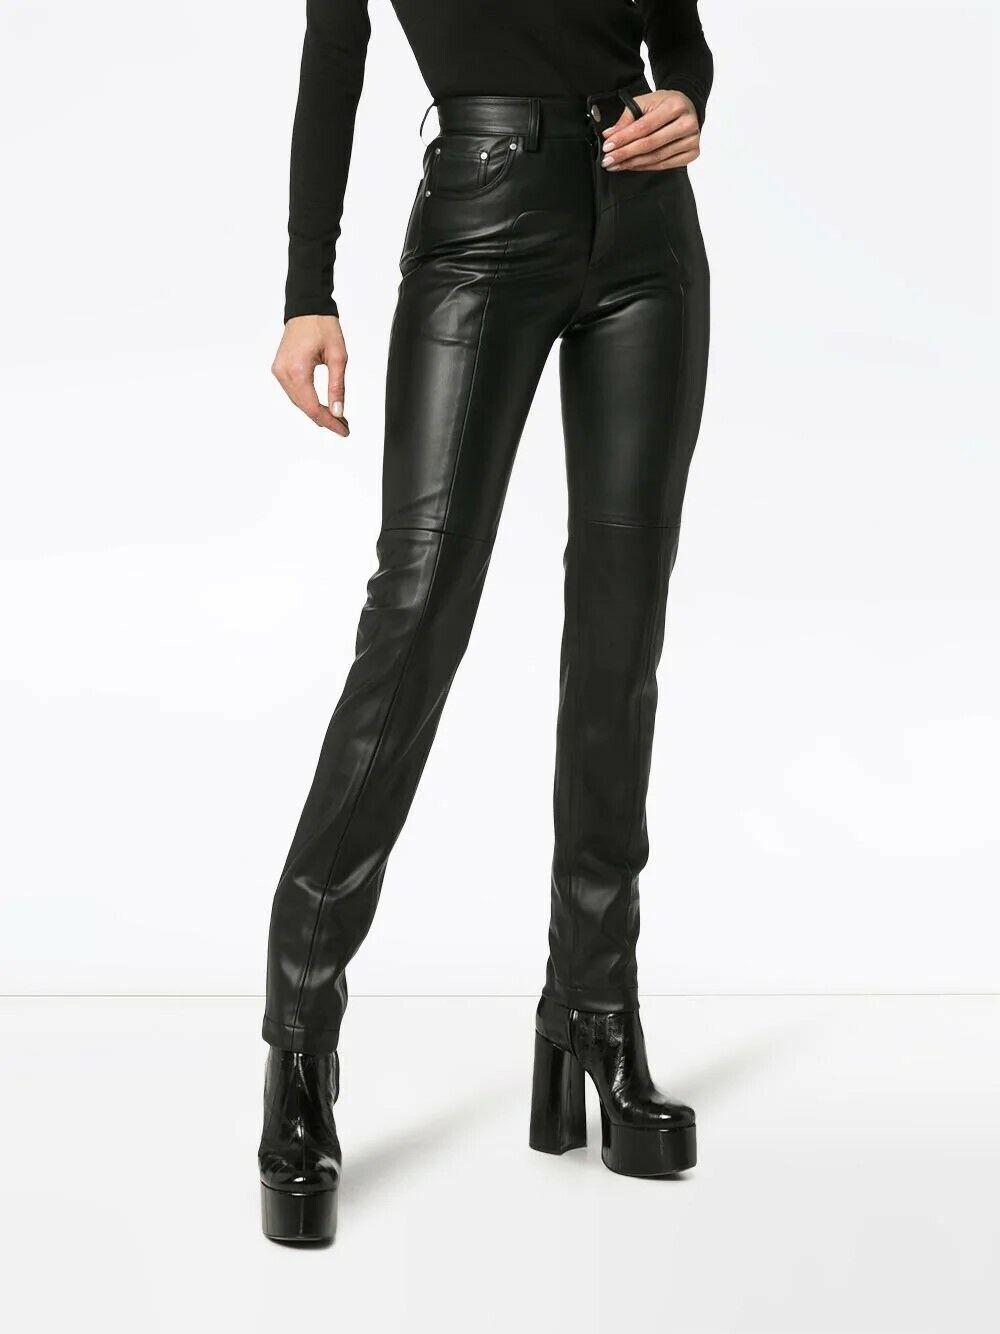 Leder Leggings Hose Damen Hohe Taille Skinny Stretch Nass Schwarz Geschnürt 14